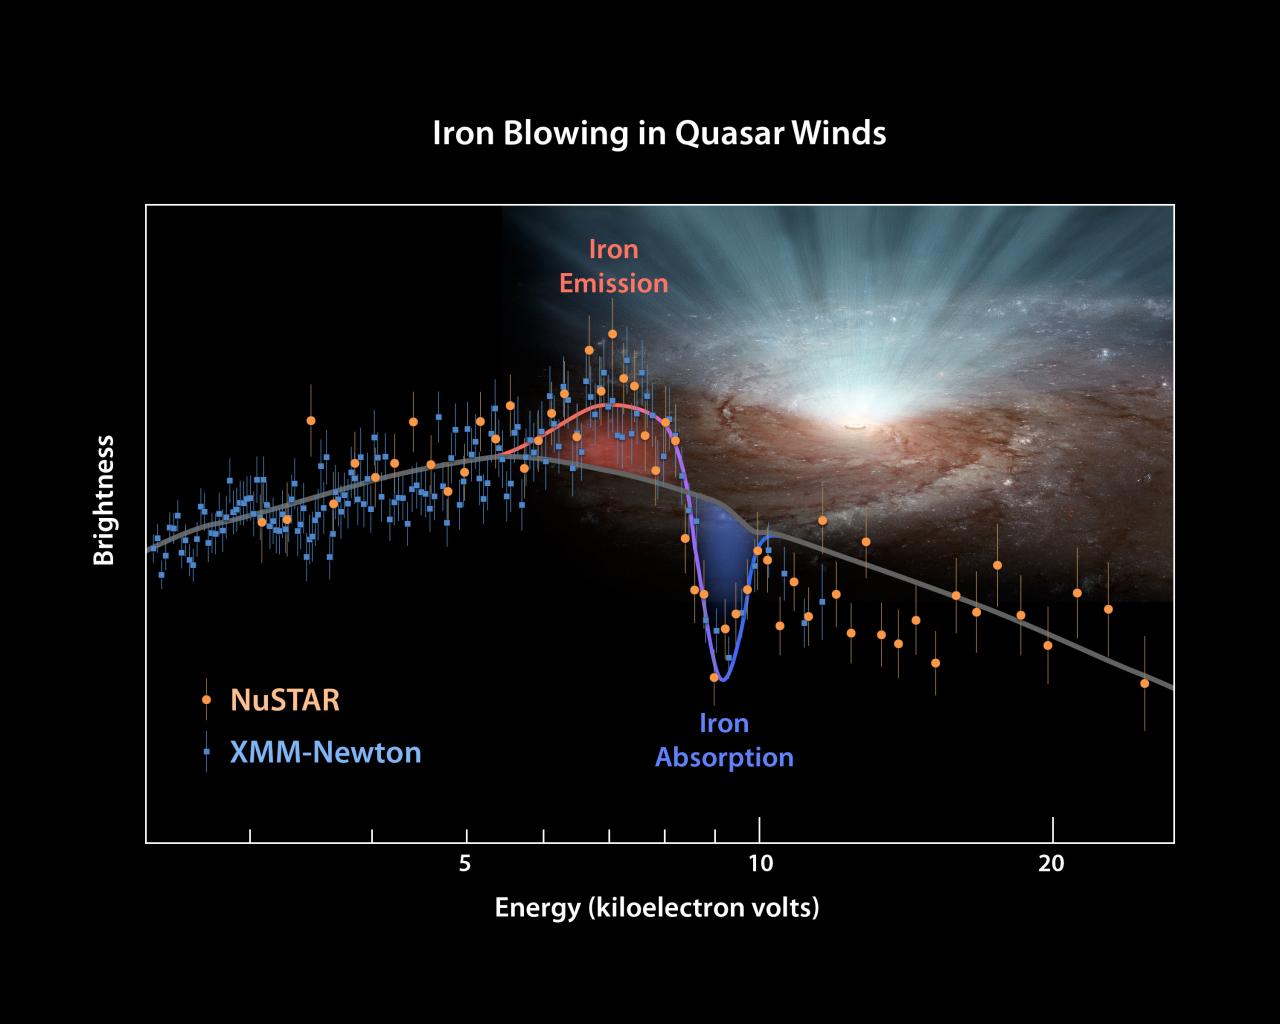 1567215745839-XMM-Newton_NuSTAR_Quasar_PDS-456_spectrum_1280.jpg